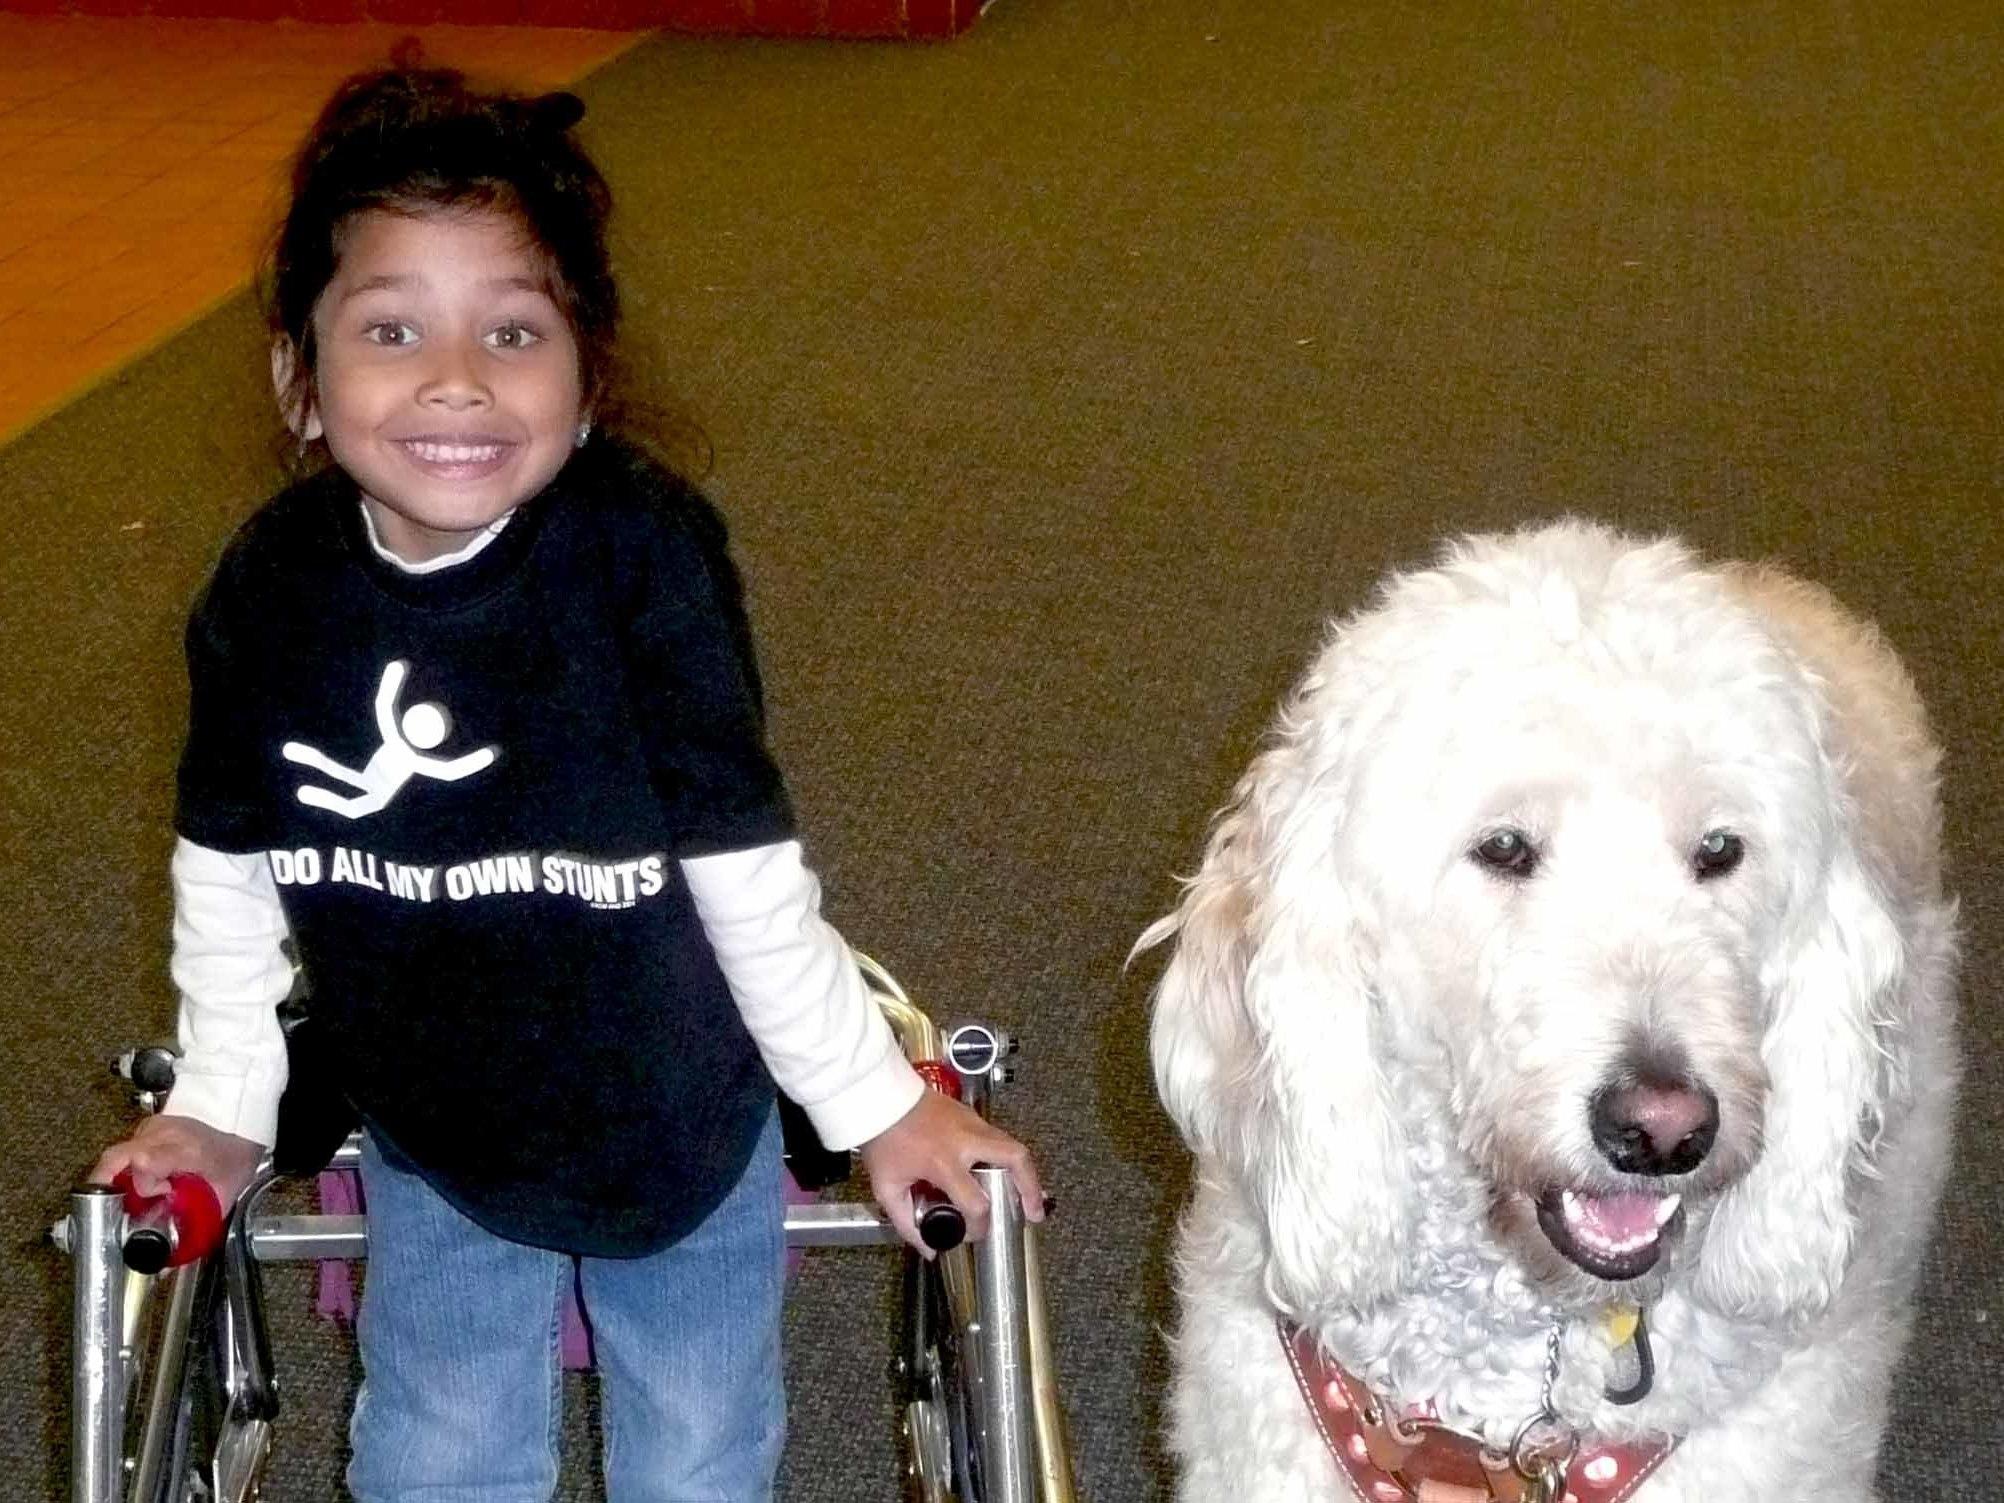 Ehlena Fry, then in kindergarten, stands with her service dog, Wonder. Courtesy ACLU.